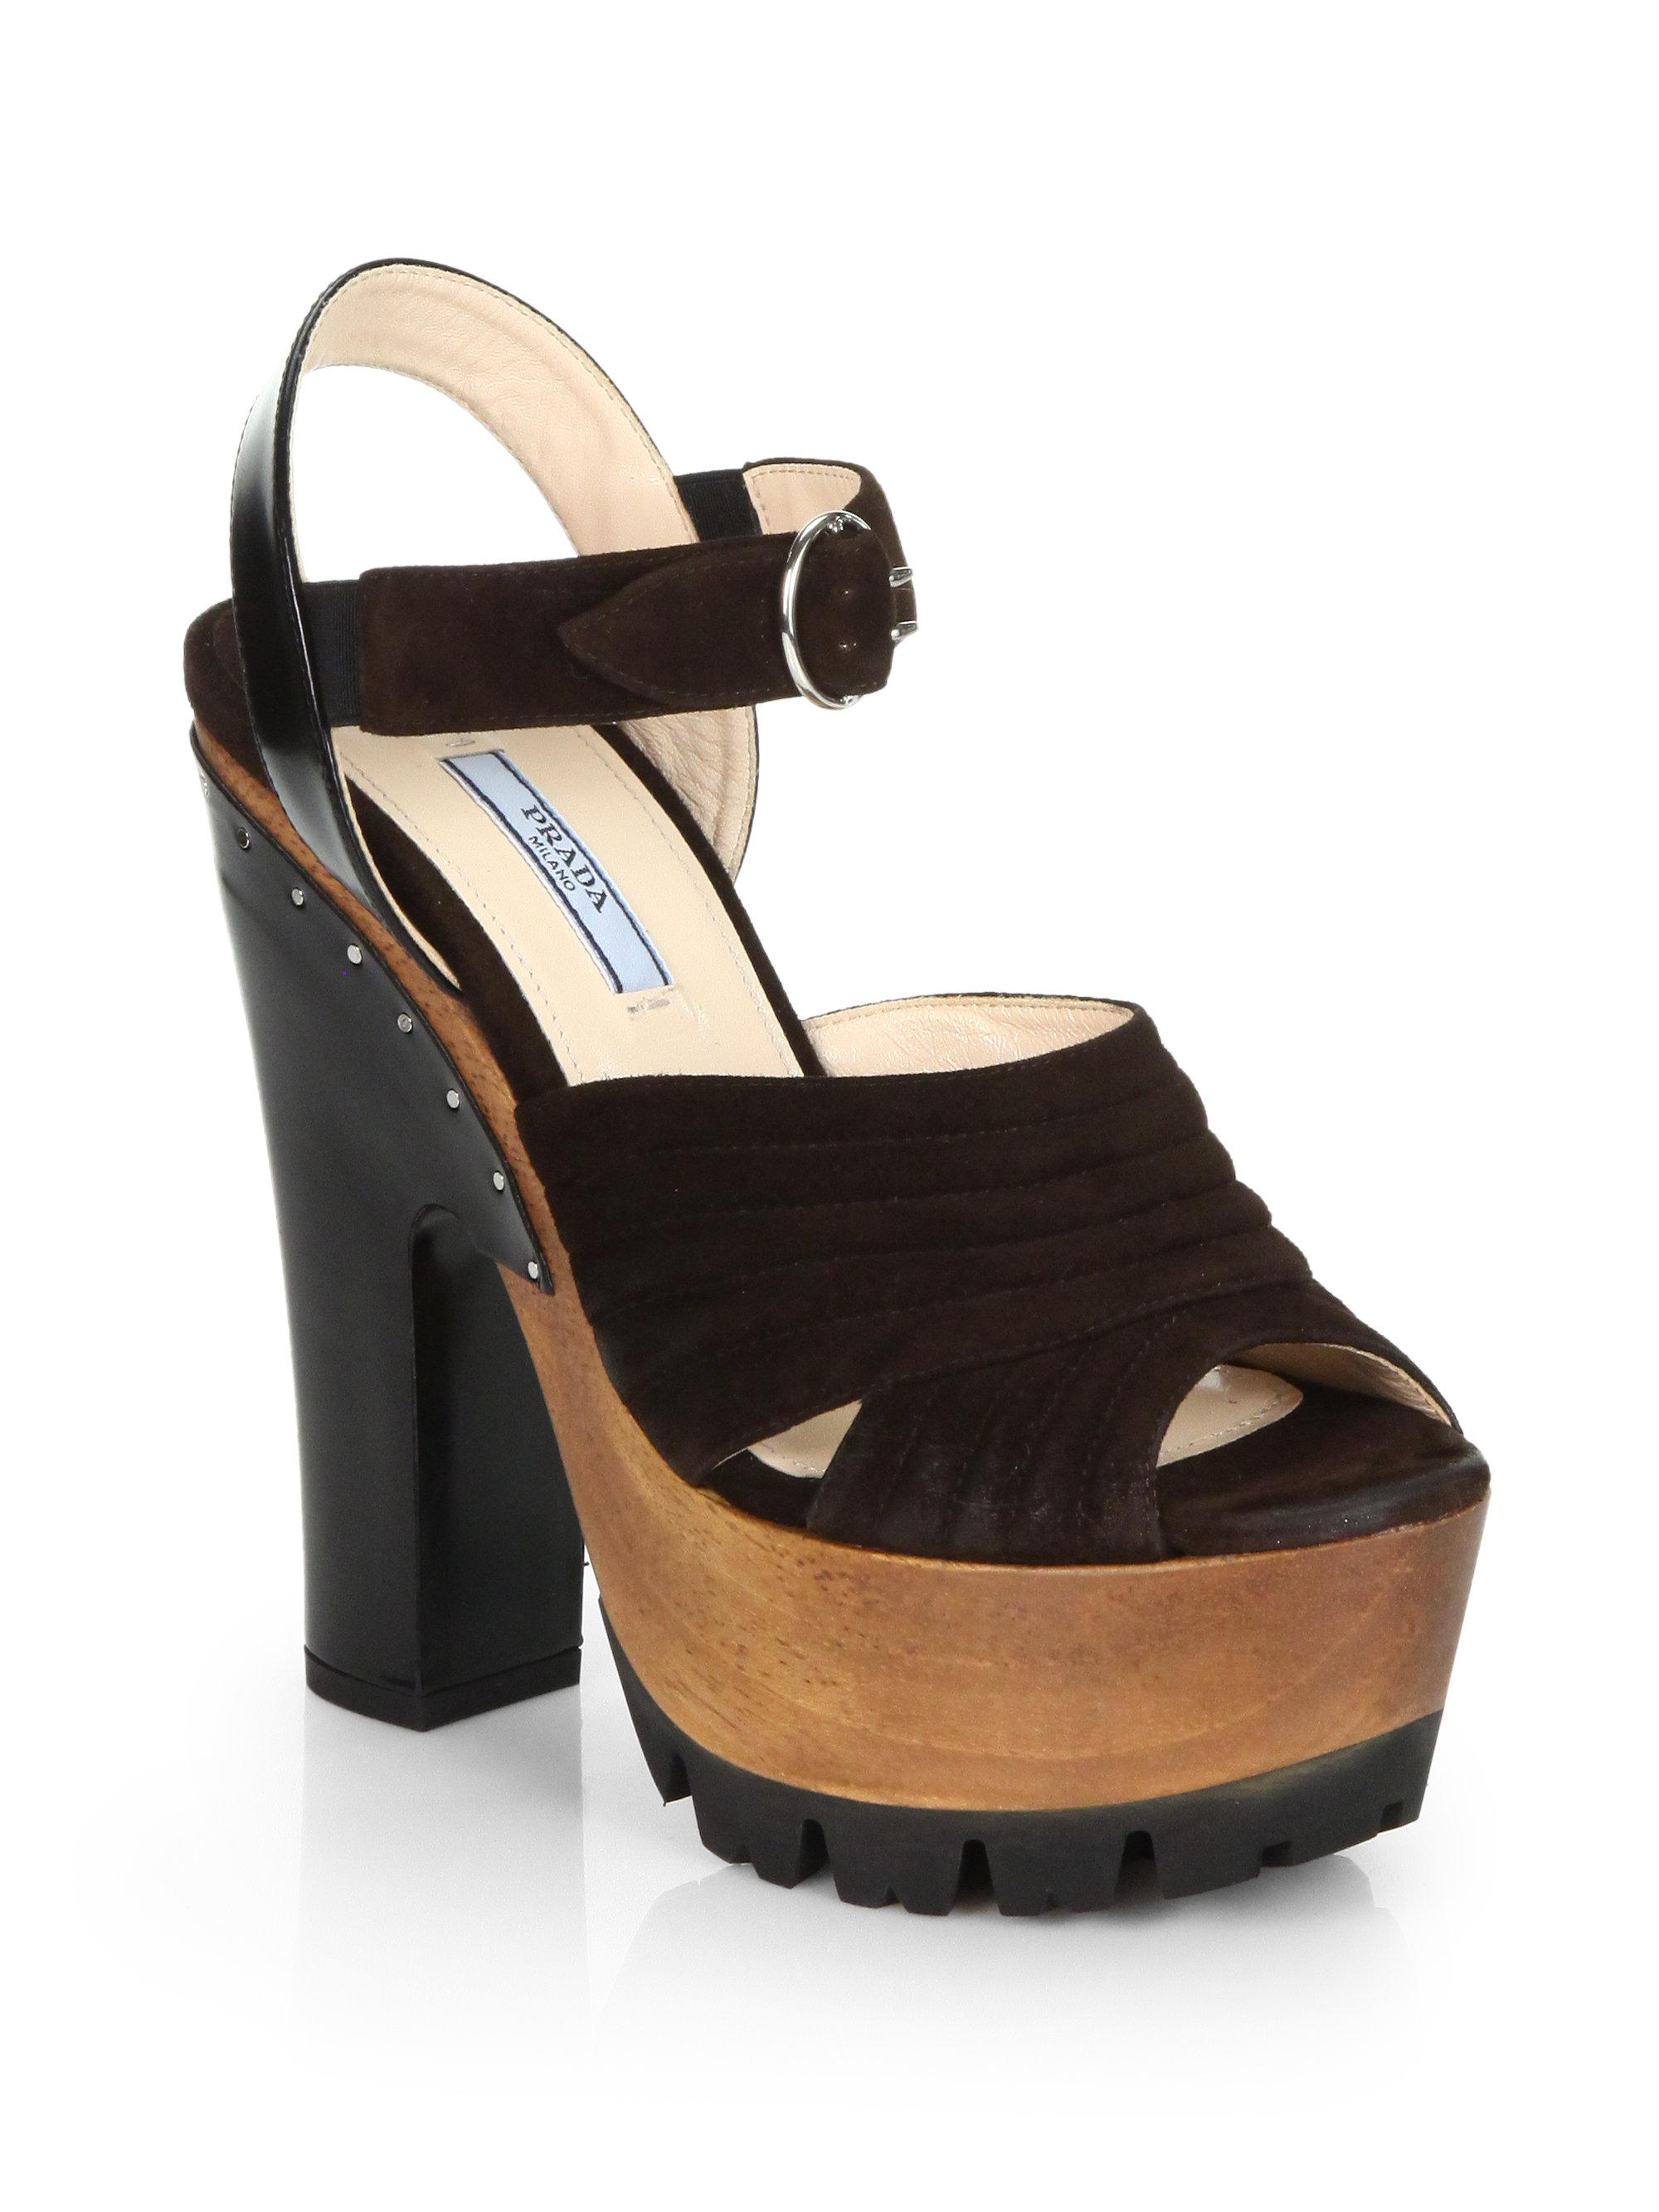 Prada Suede Wooden Platform Sandals In Black Brown Black